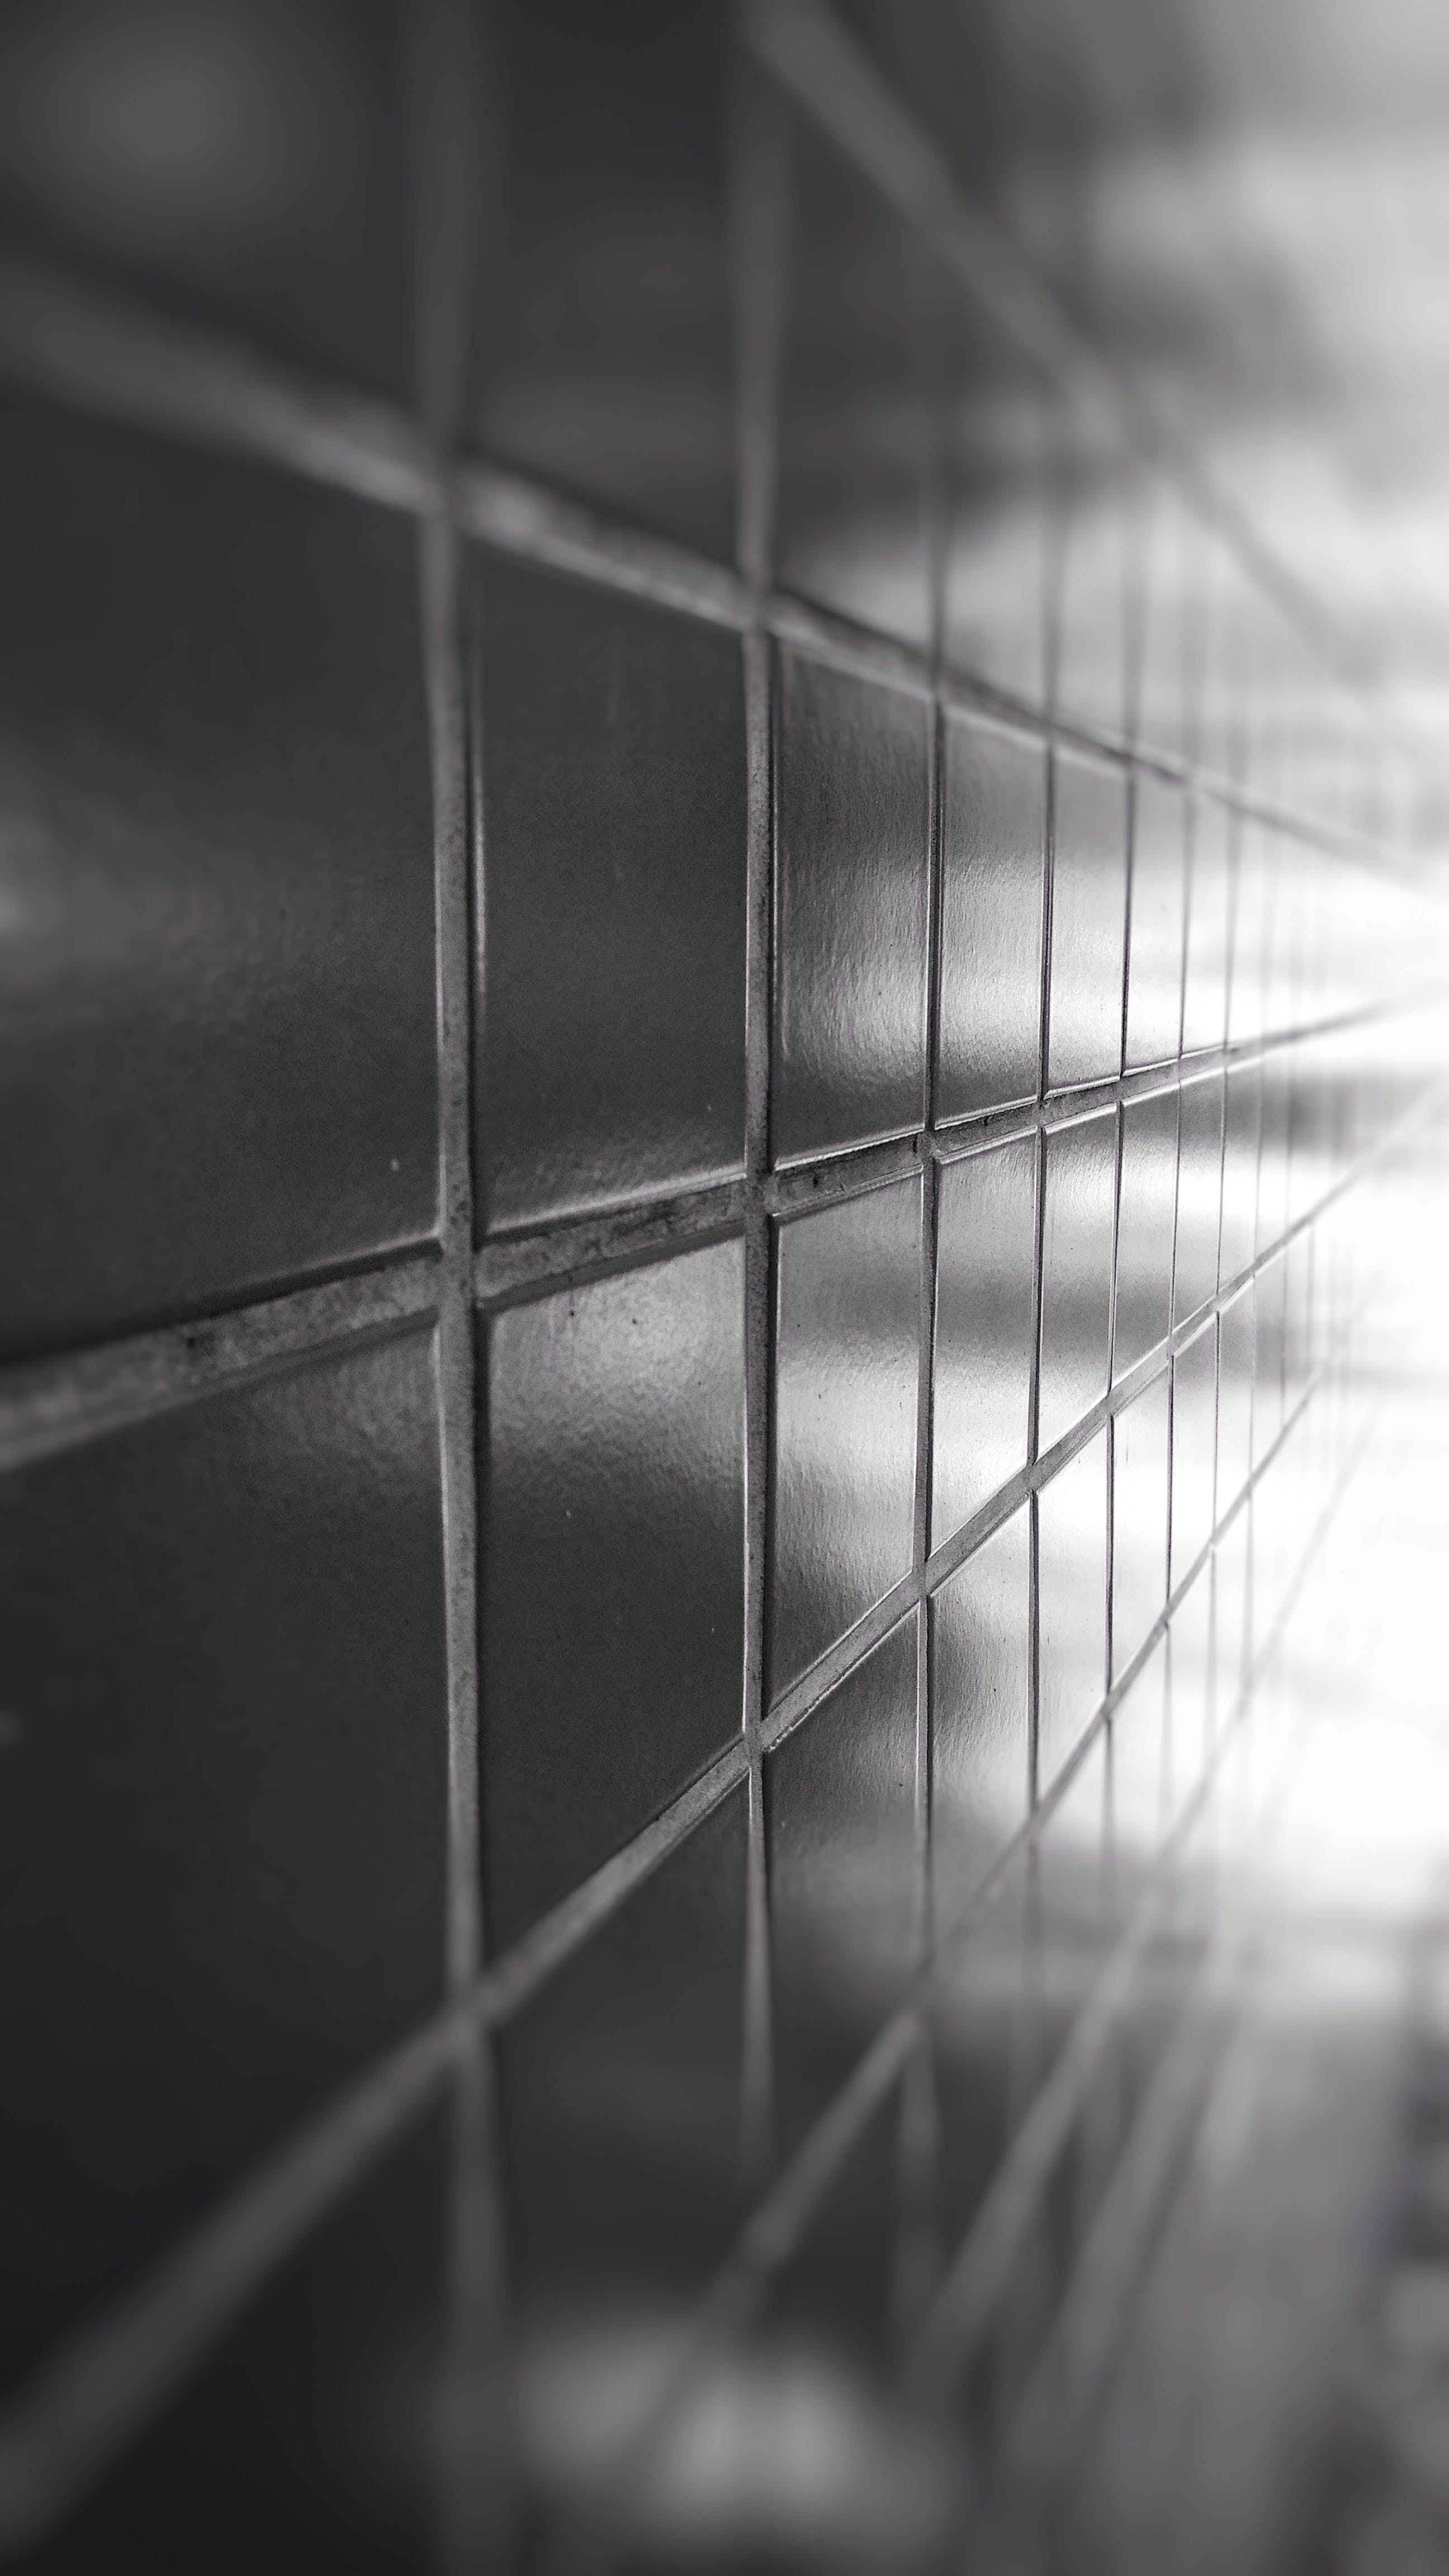 Free stock photo of architecture, black, black and white, black background